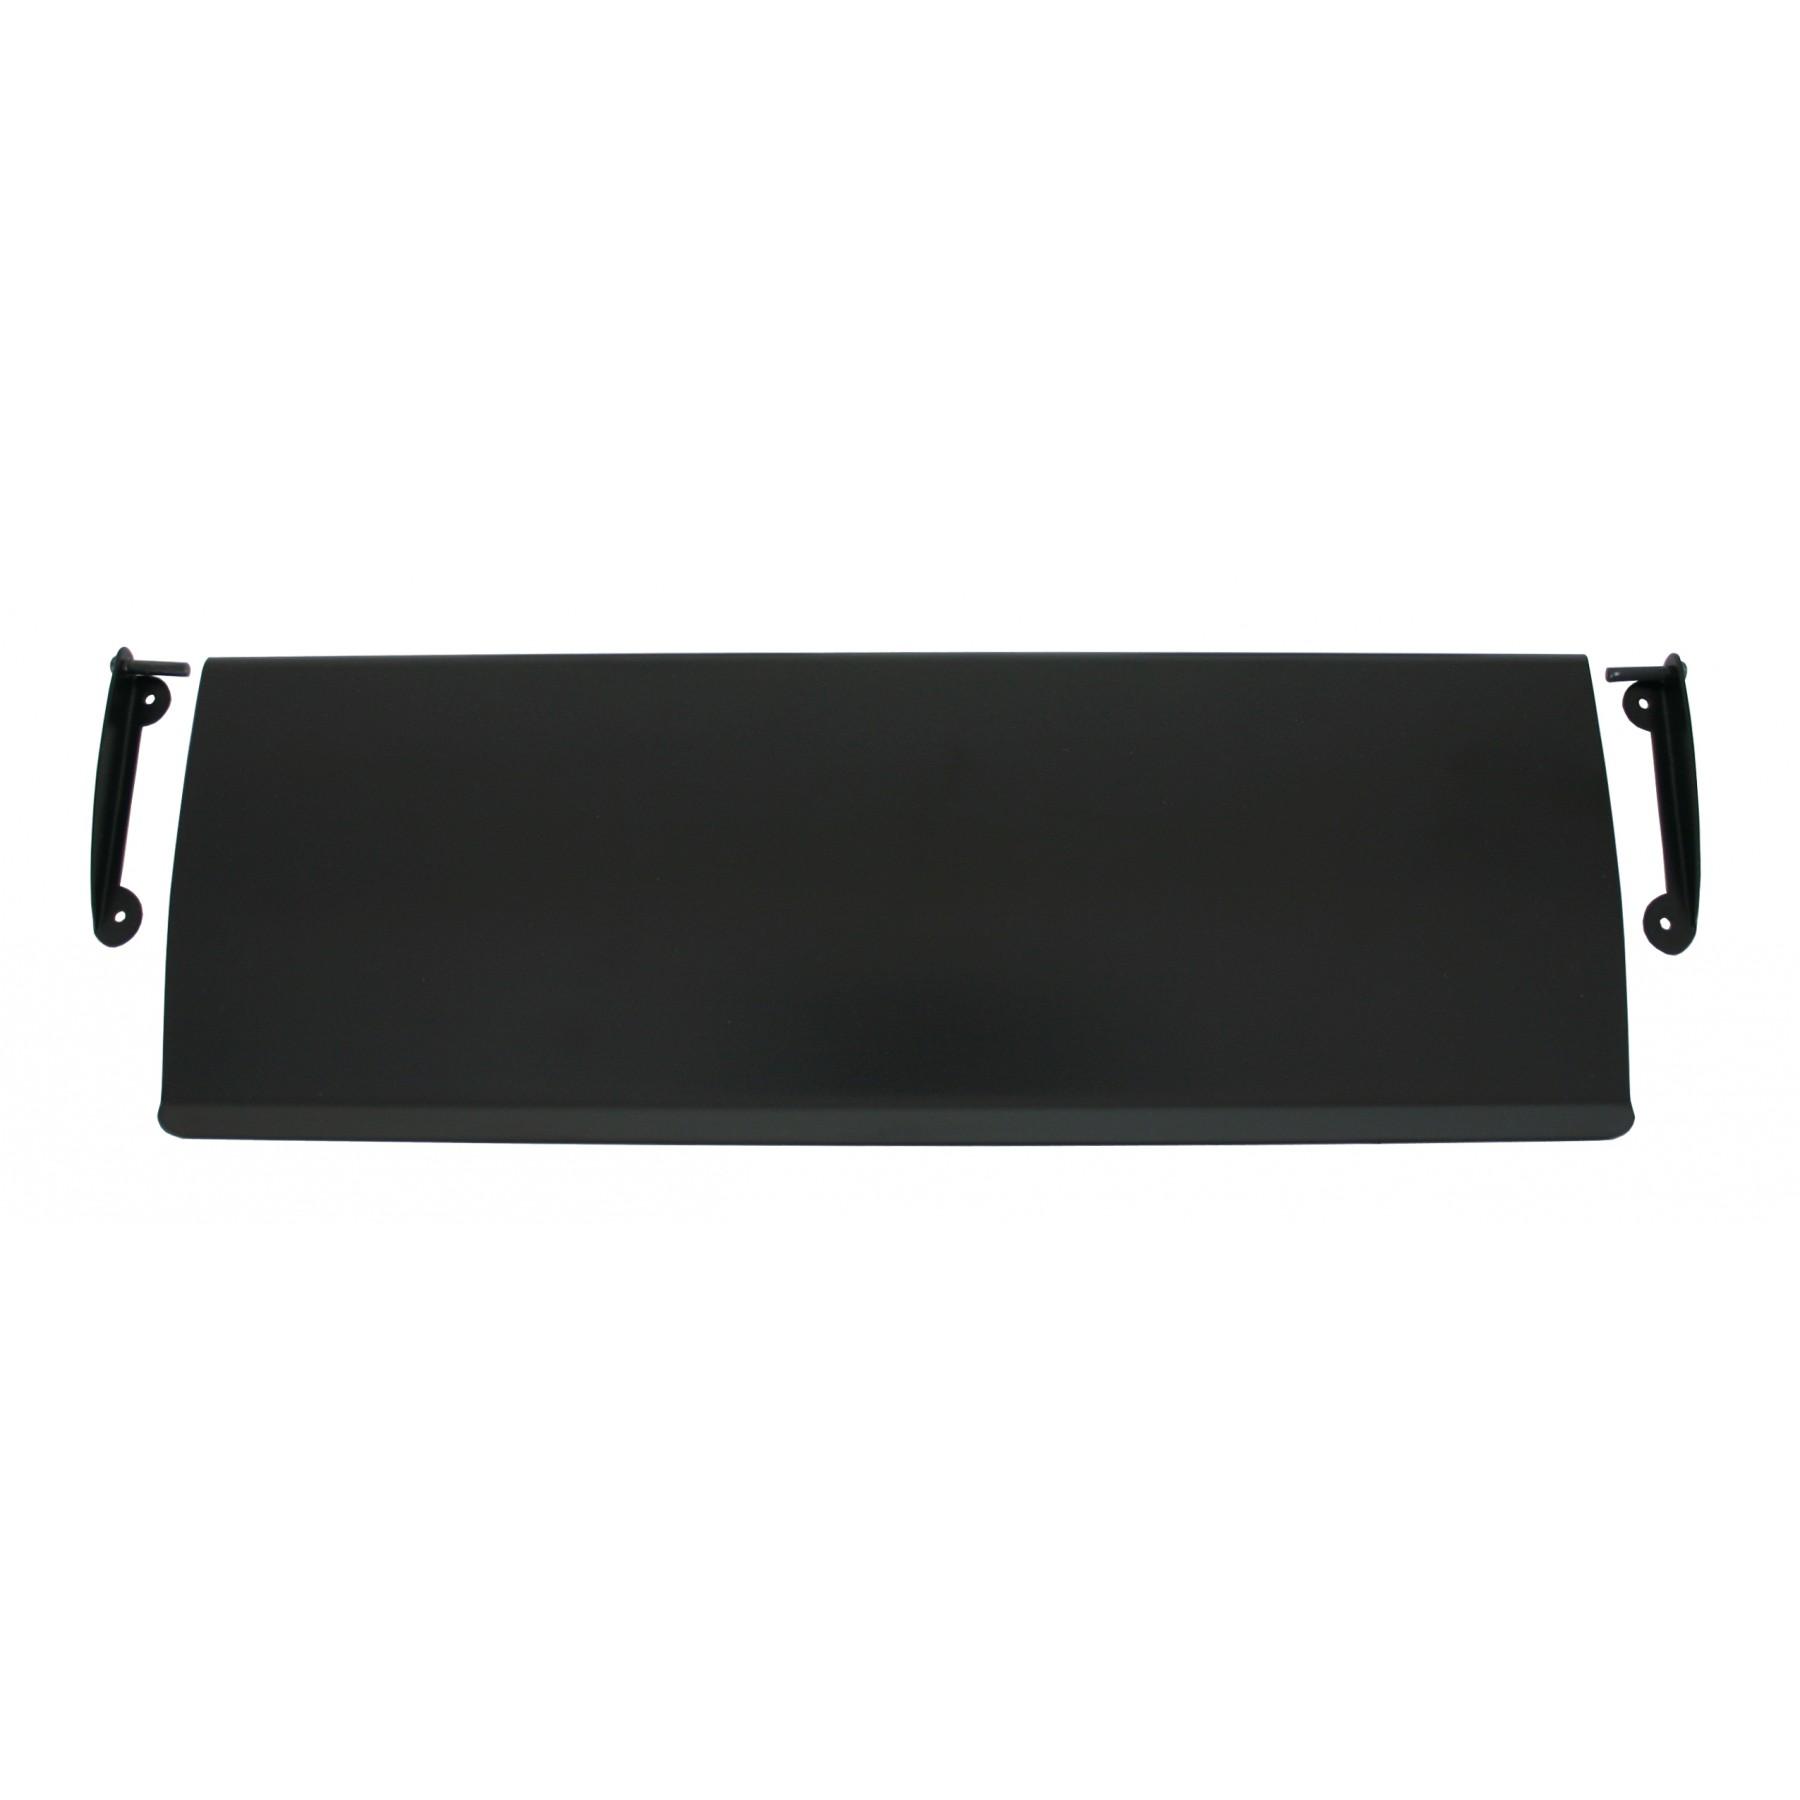 Black Letter Plate Cover